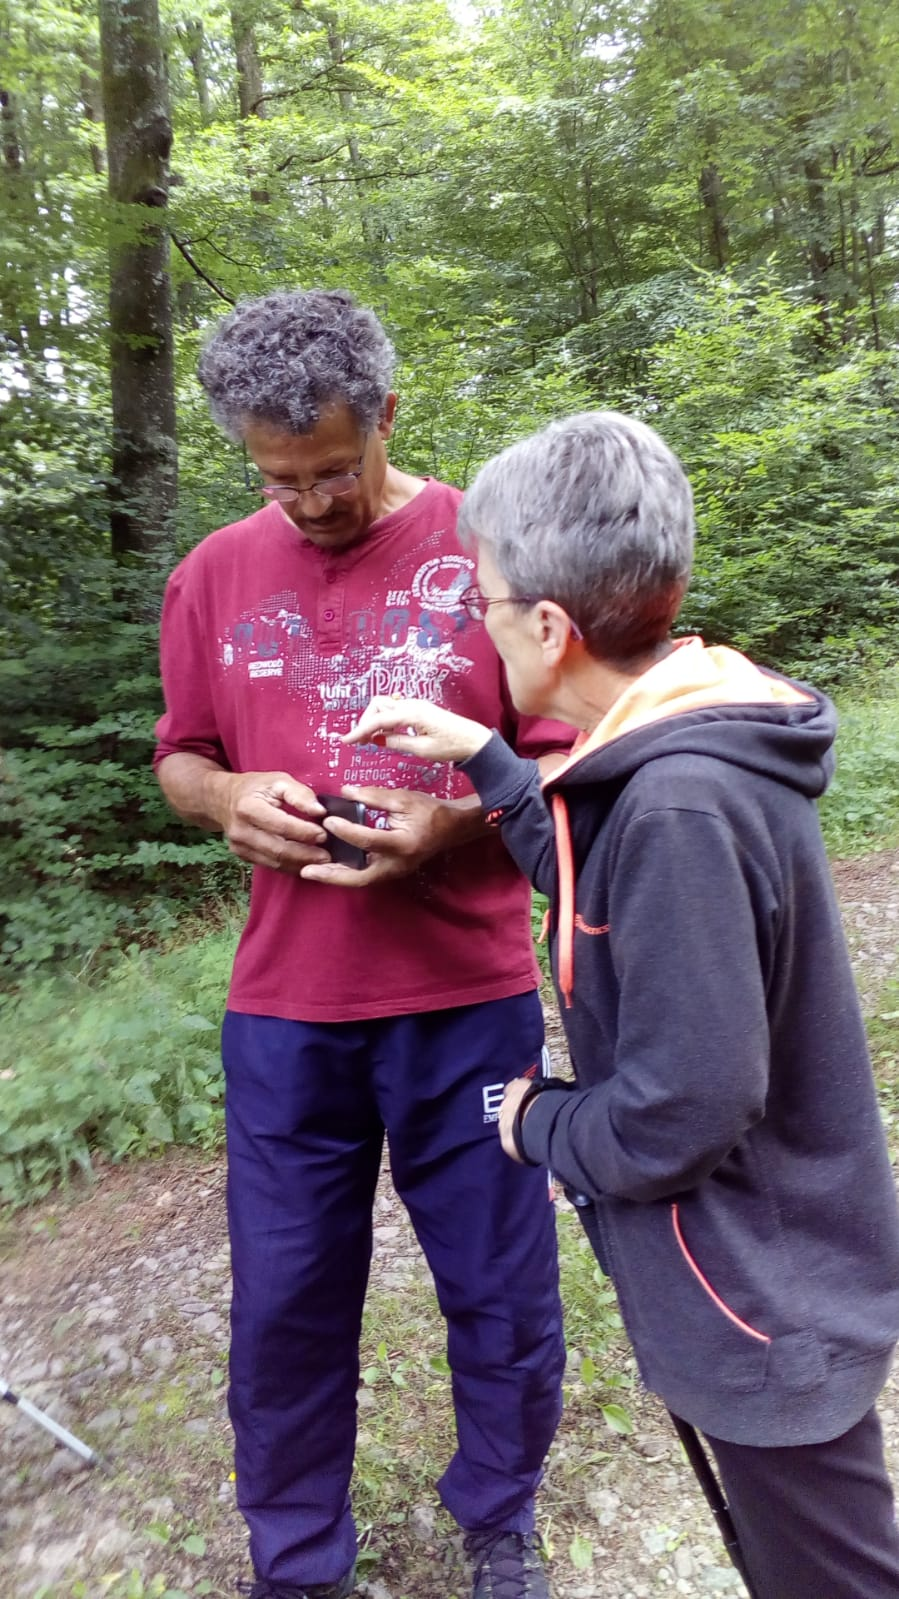 Plateau marmagne le 18 juin 2018 n 12